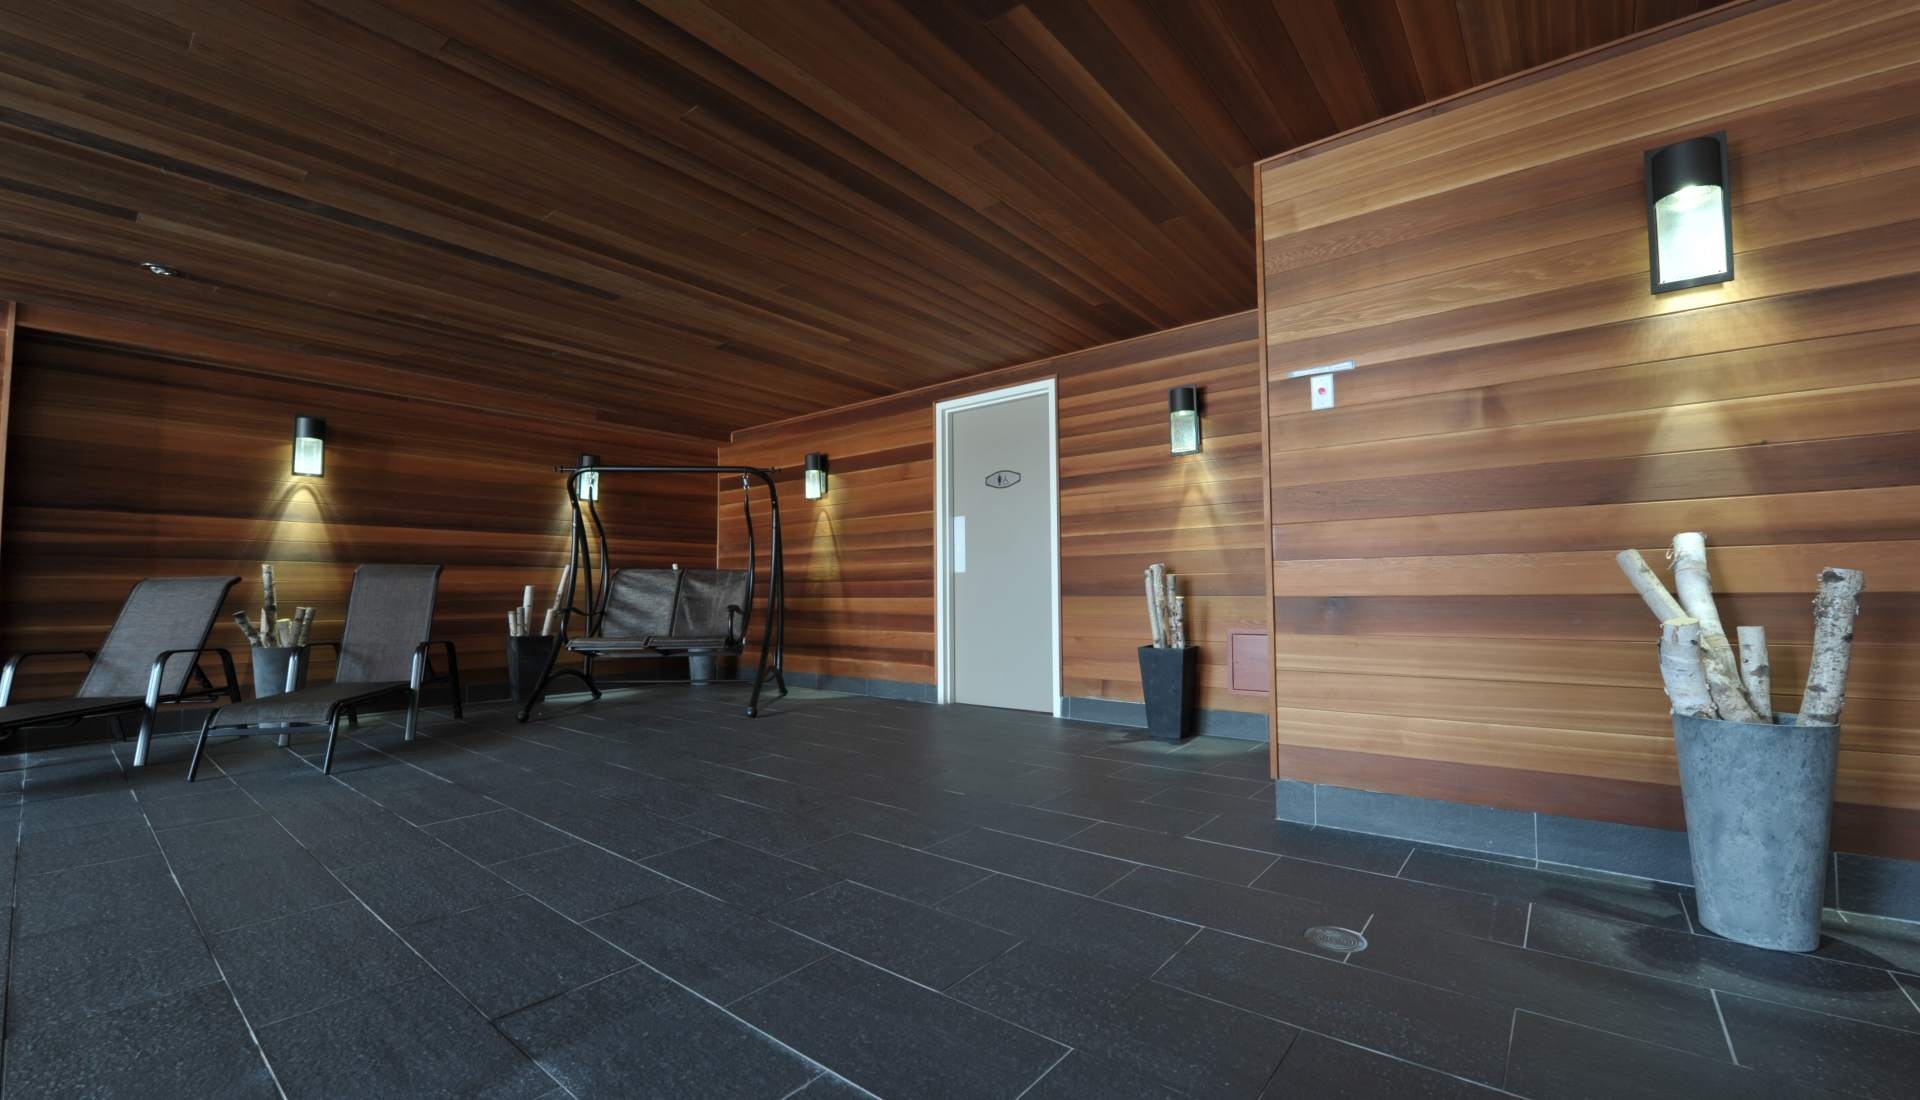 Bardage cedre rouge prix maison design for Prix bardage bois interieur